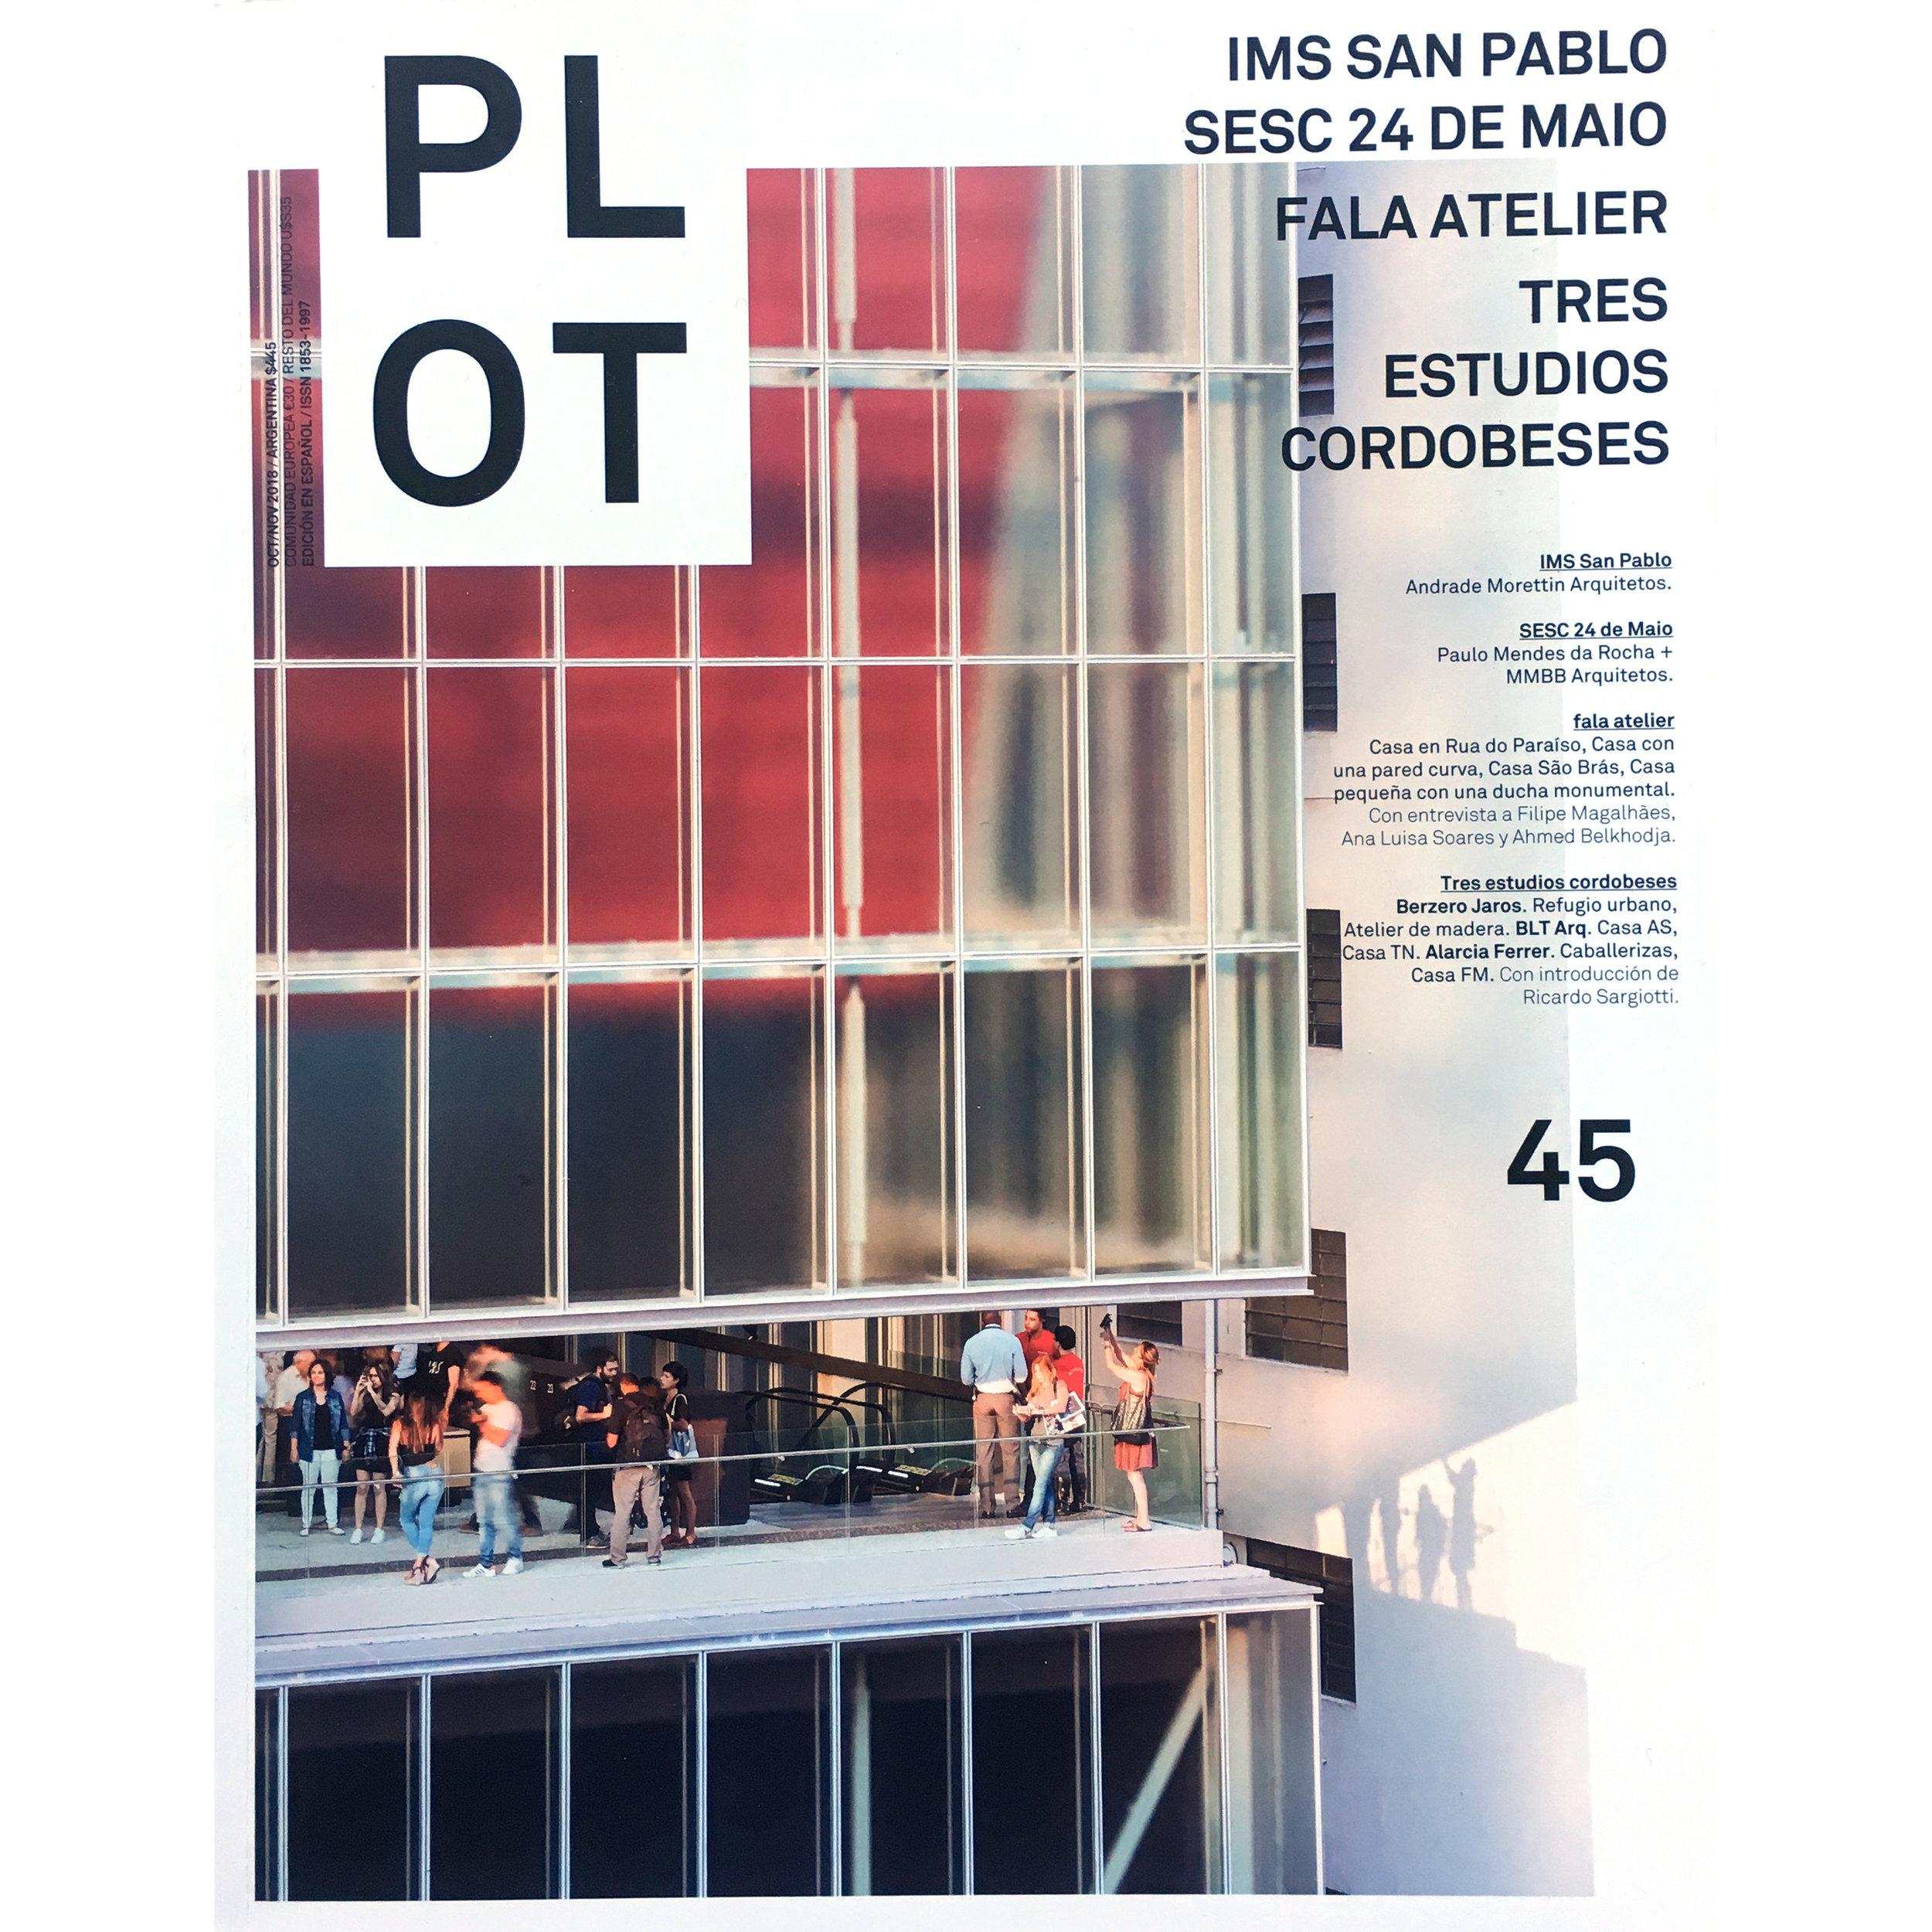 PLOT 45. 2019 ( Printed Publication)